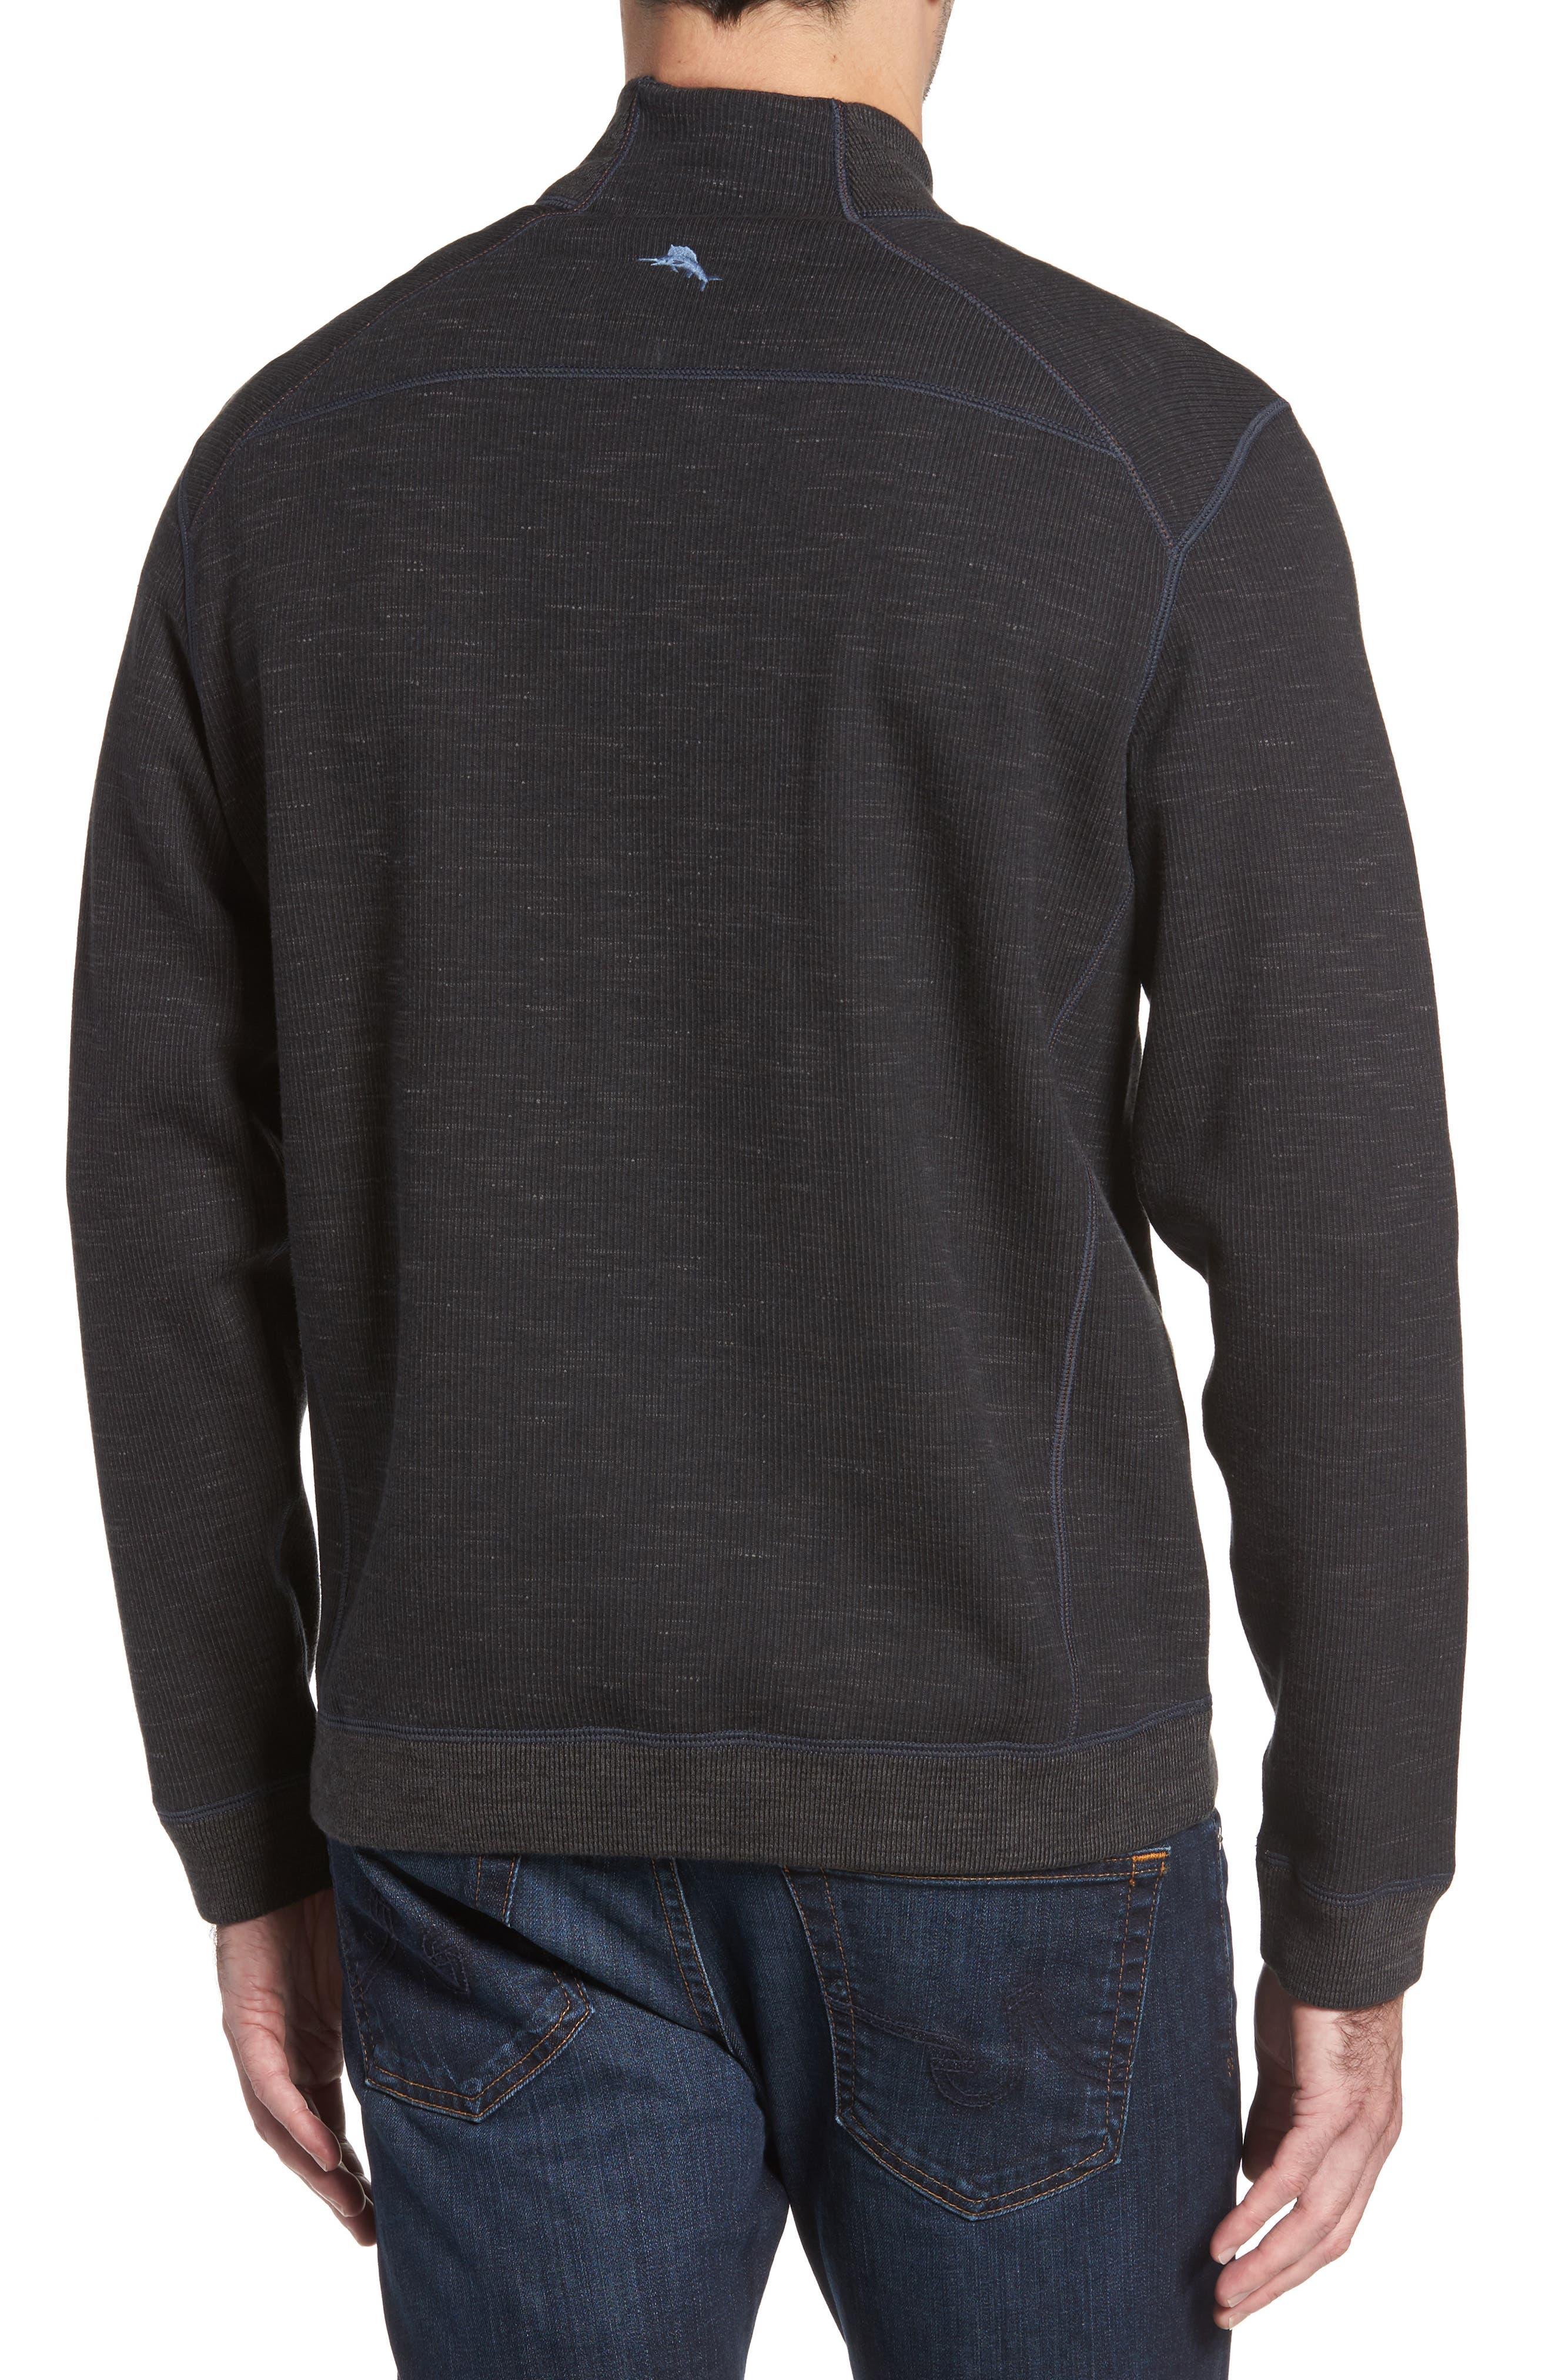 Flipsider Half Zip Reversible Sweatshirt,                             Alternate thumbnail 2, color,                             003